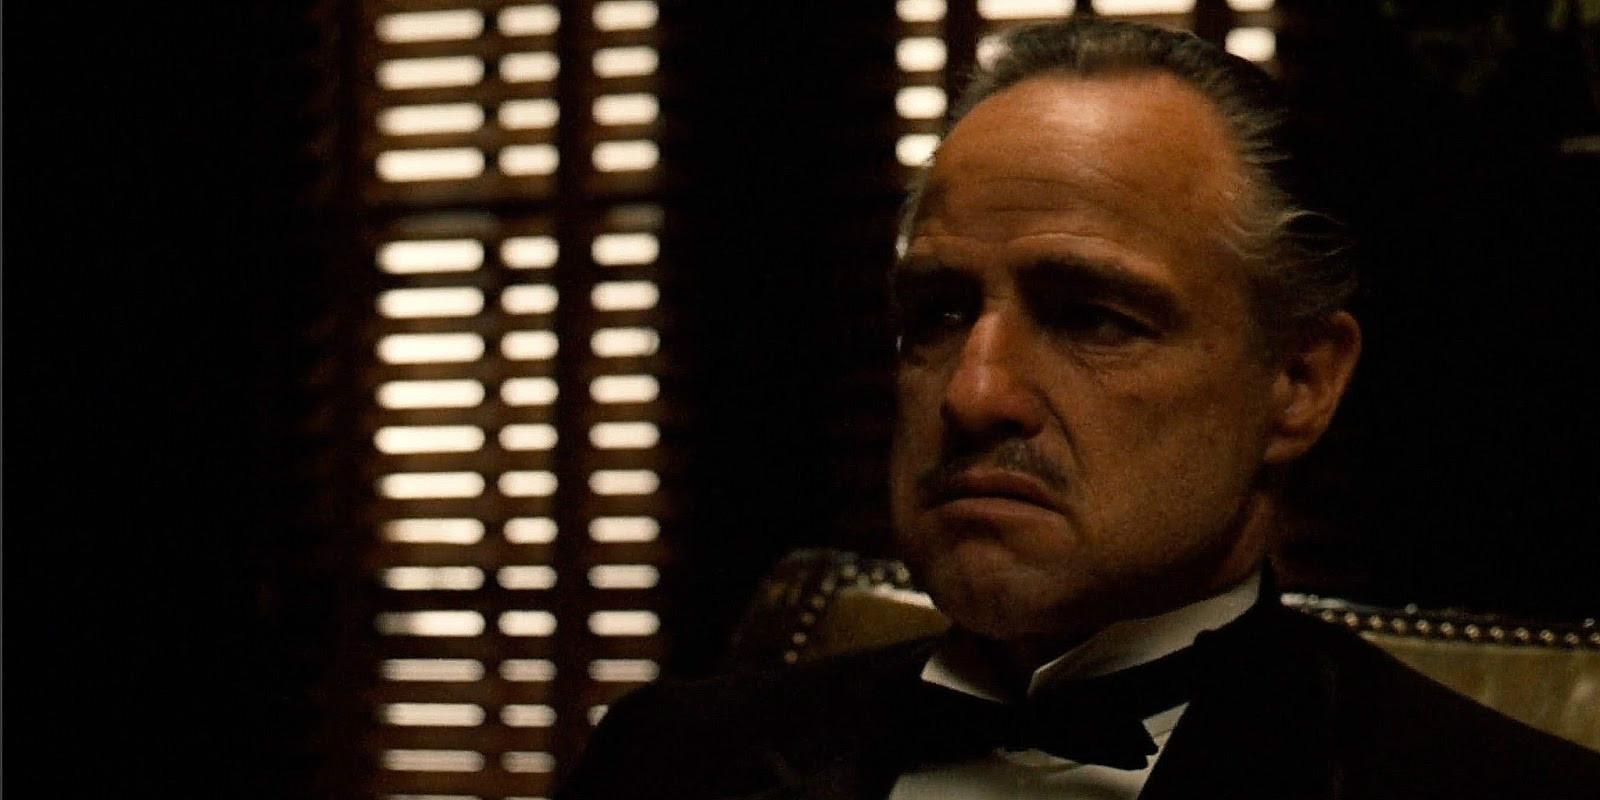 The Godfather Opening Scene